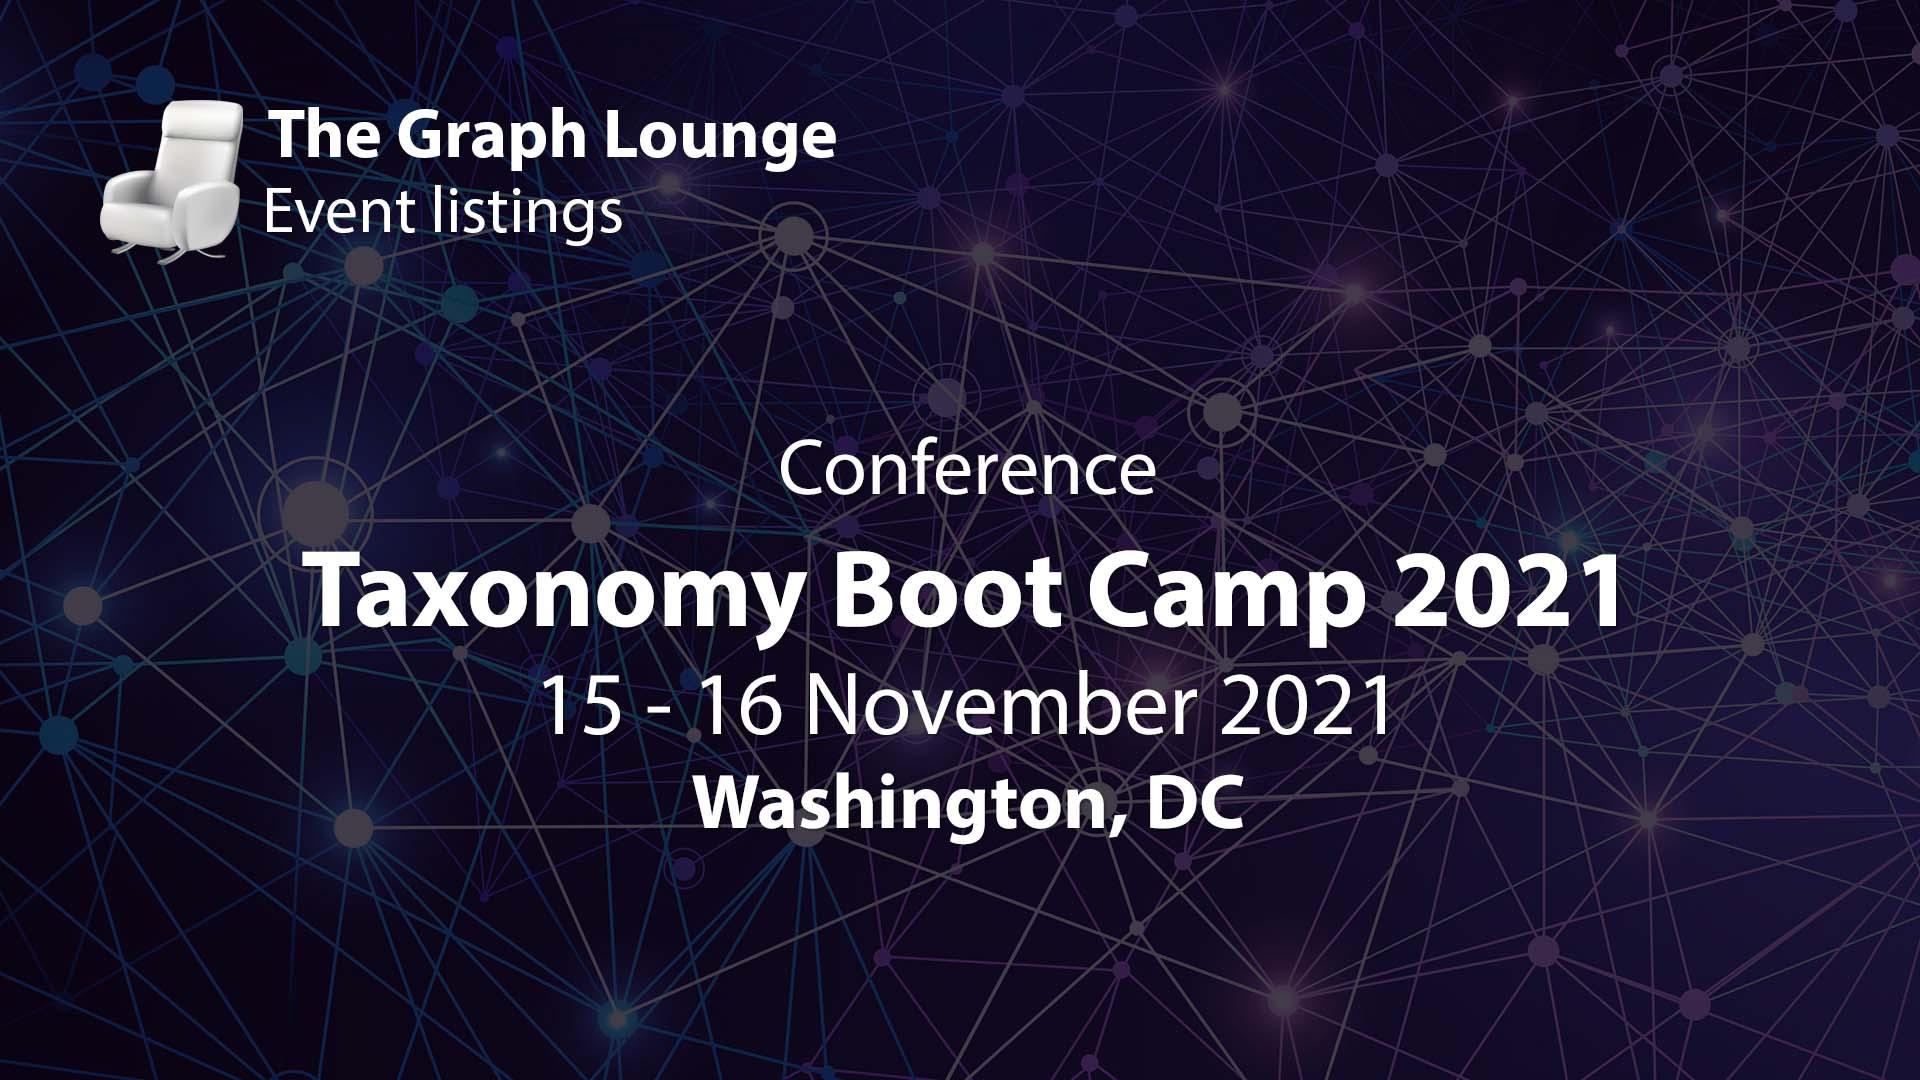 Taxonomy Bootcamp 2021 Washington, DC